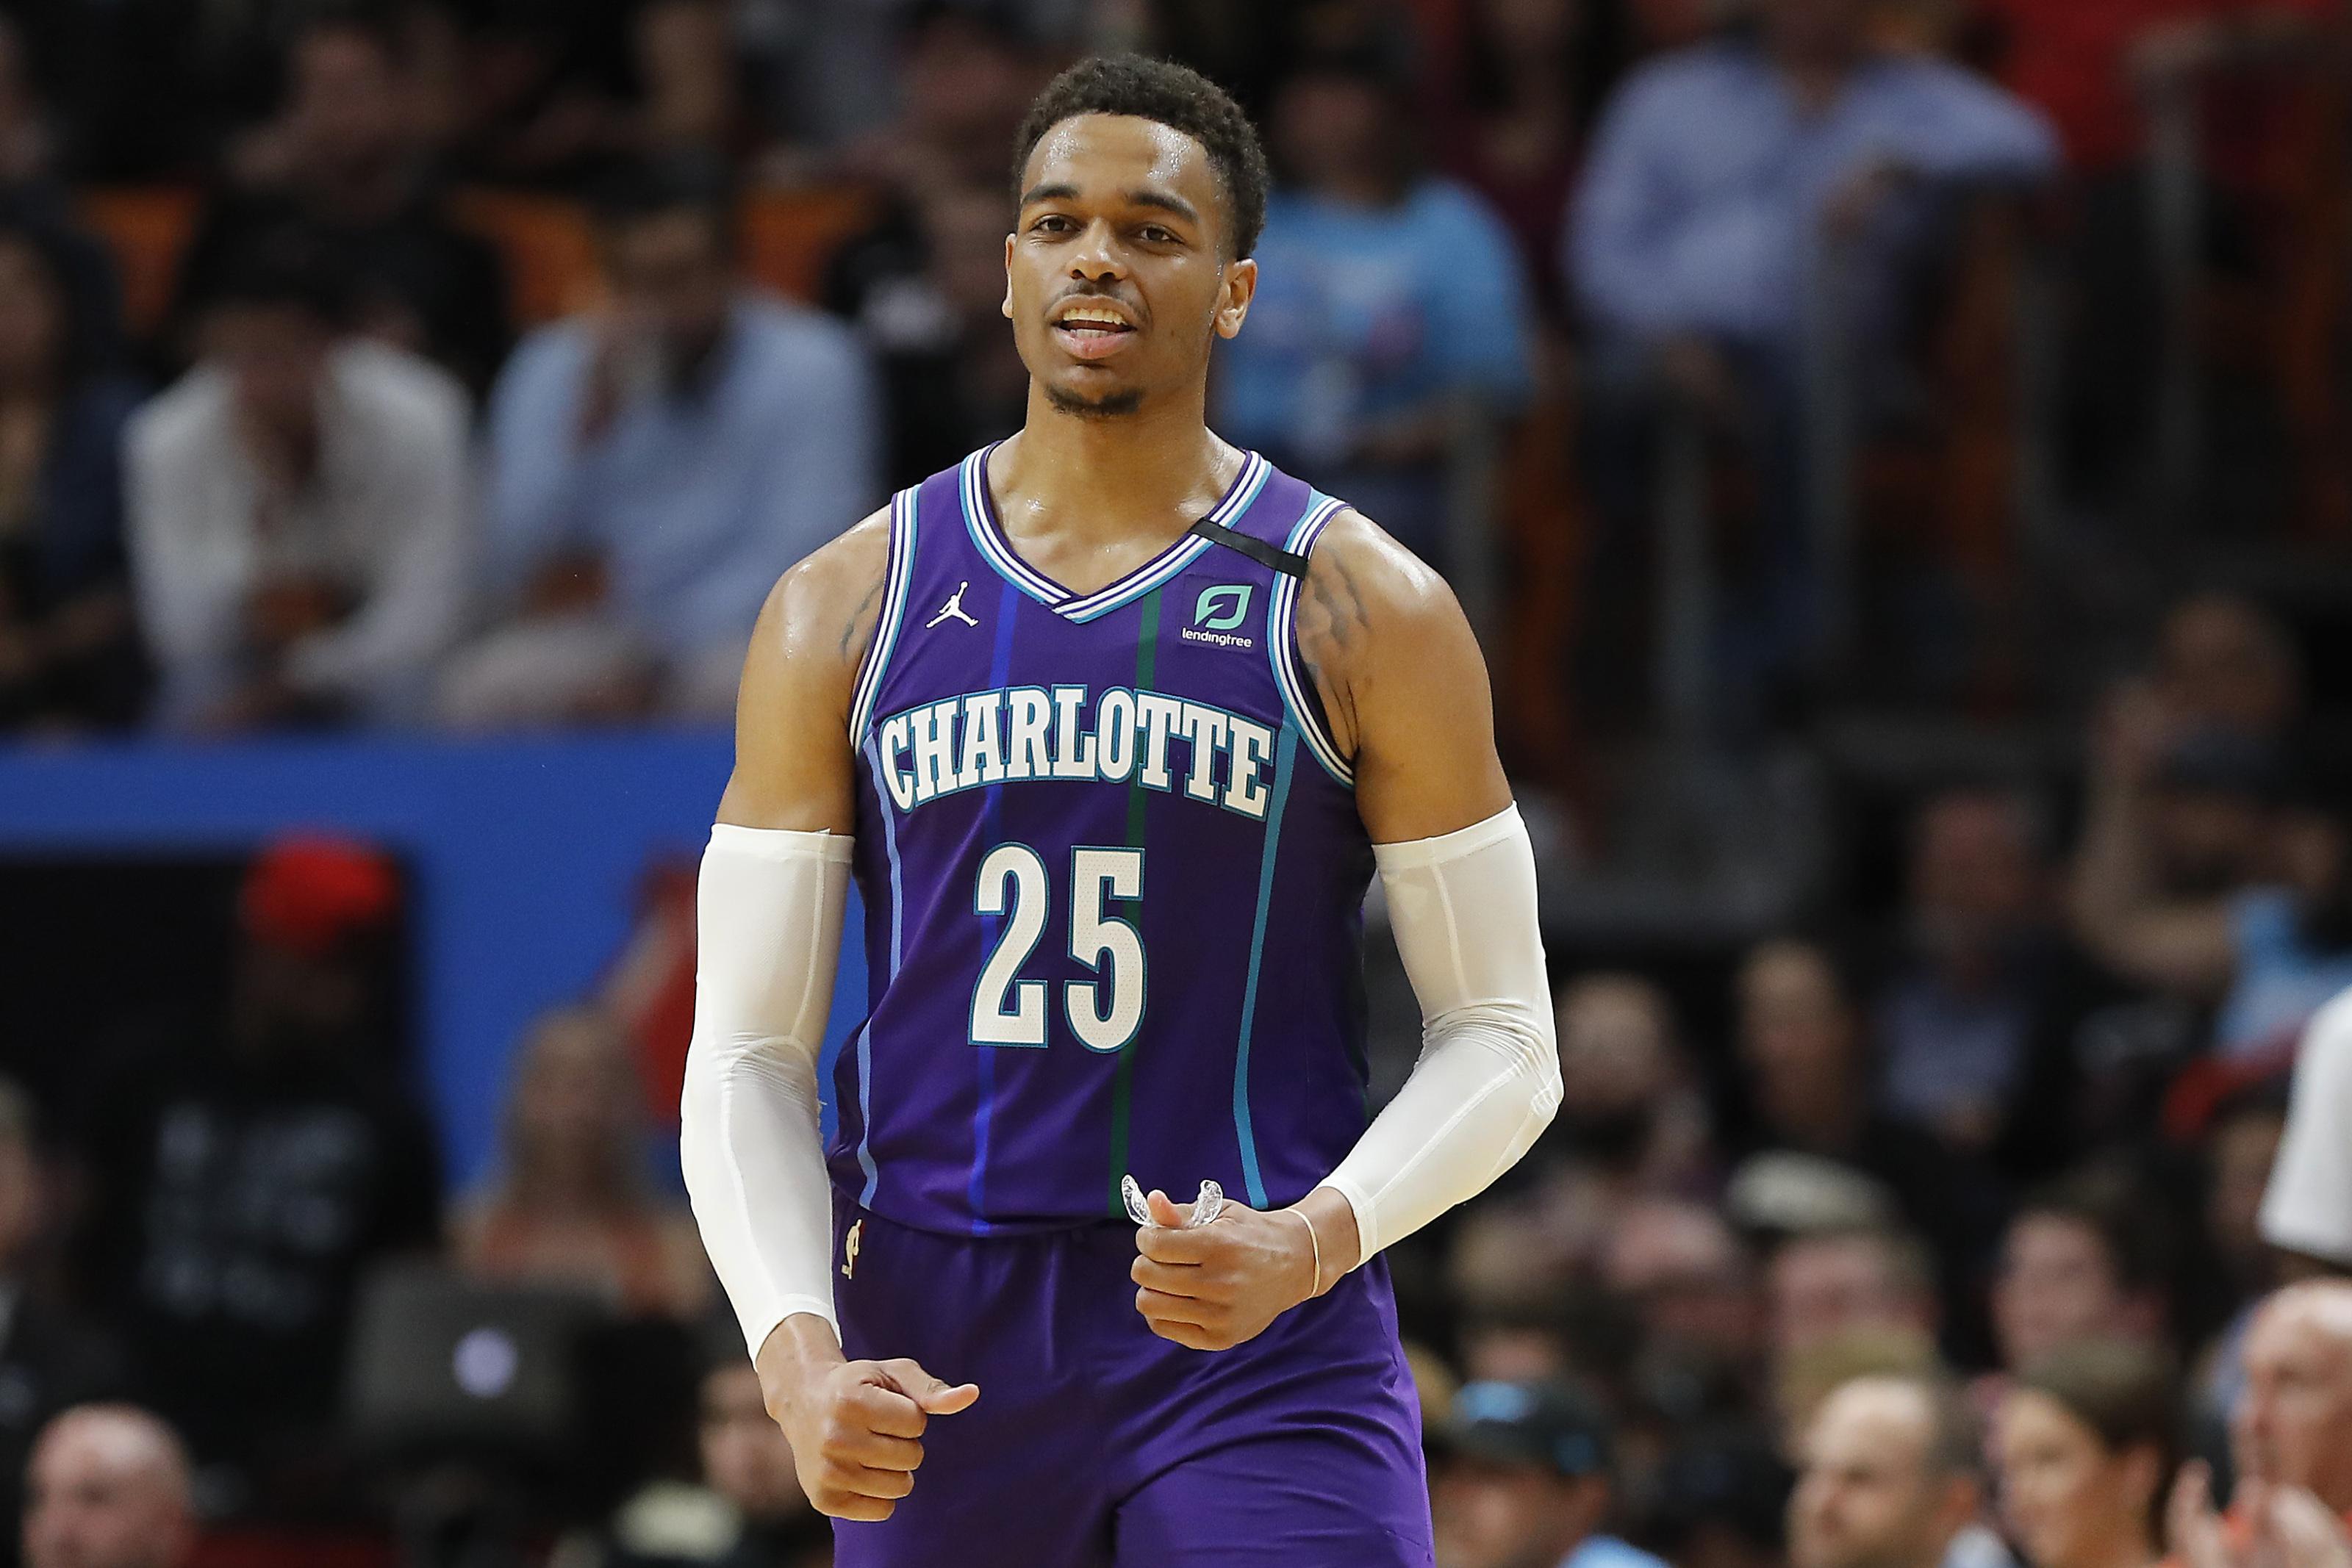 Charlotte Hornets: Grading P.J. Washington's 2019-2020 season